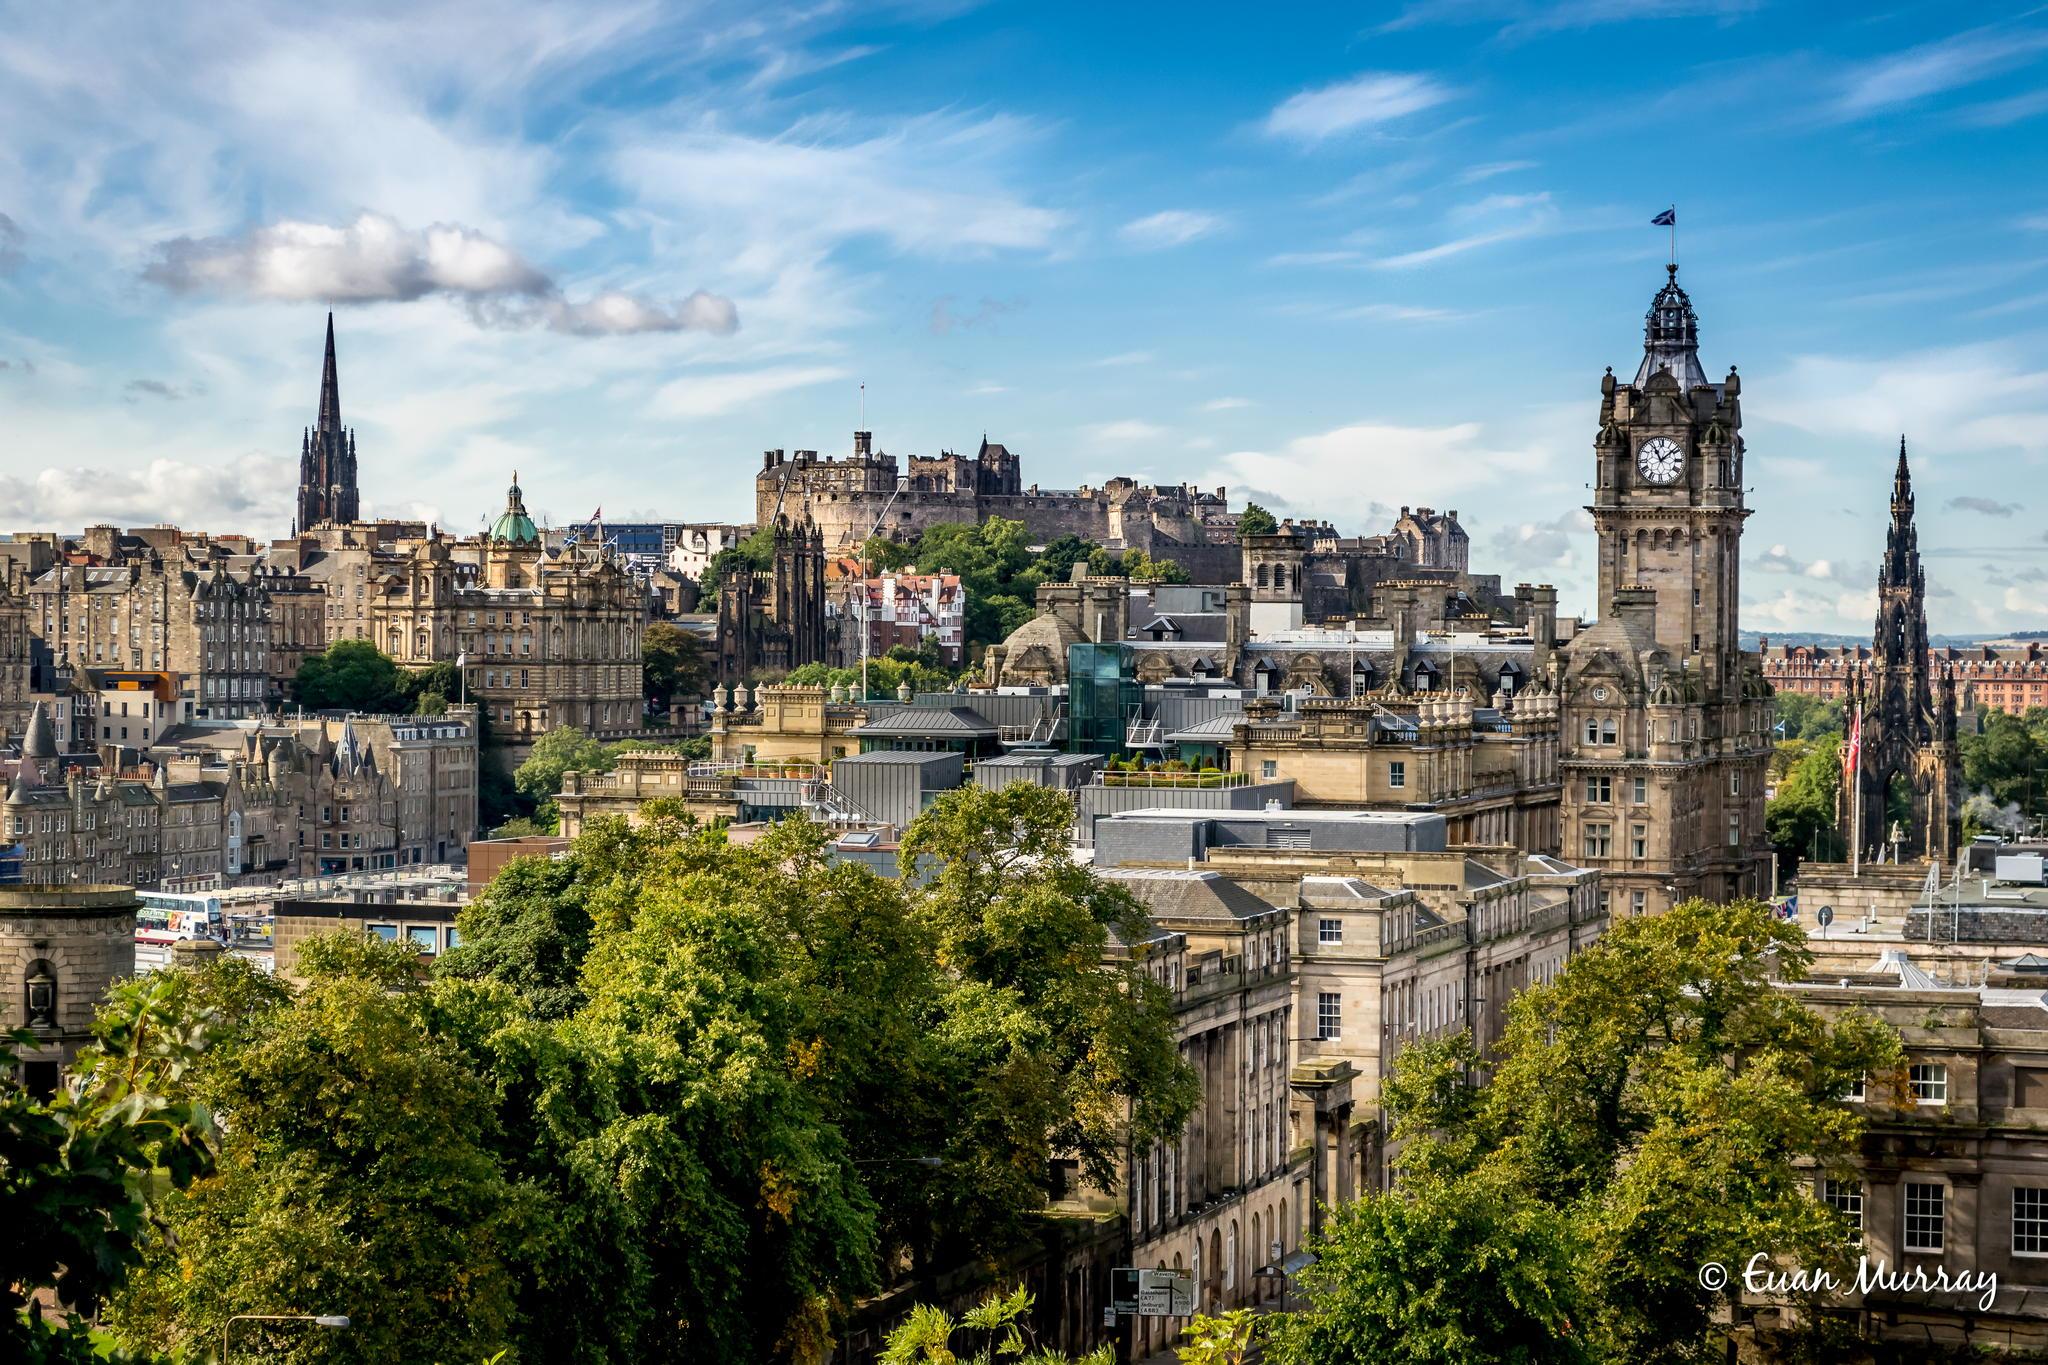 Edinburgh, the capital and historical city of Scotland